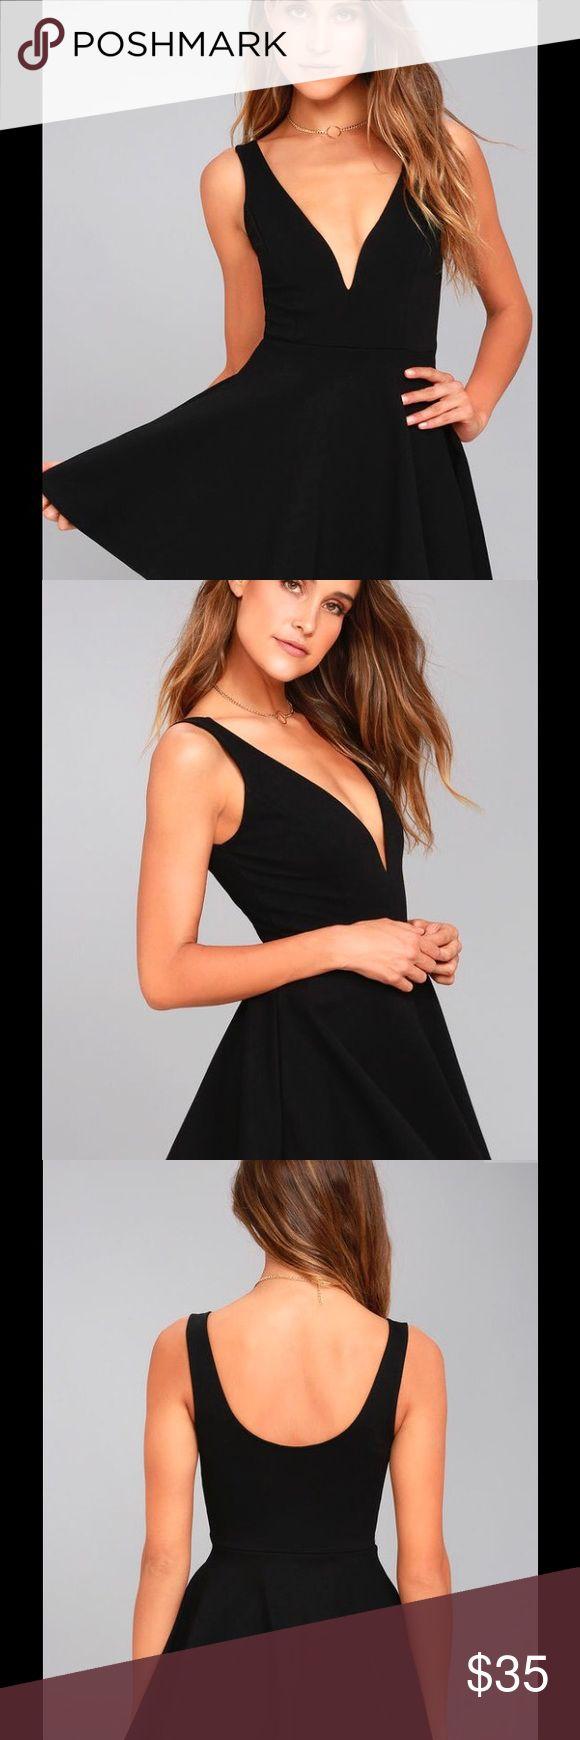 Lulu's I Feel Good Black Skort Dress Plunge neckline, stretchy material Lulu's Dresses Mini